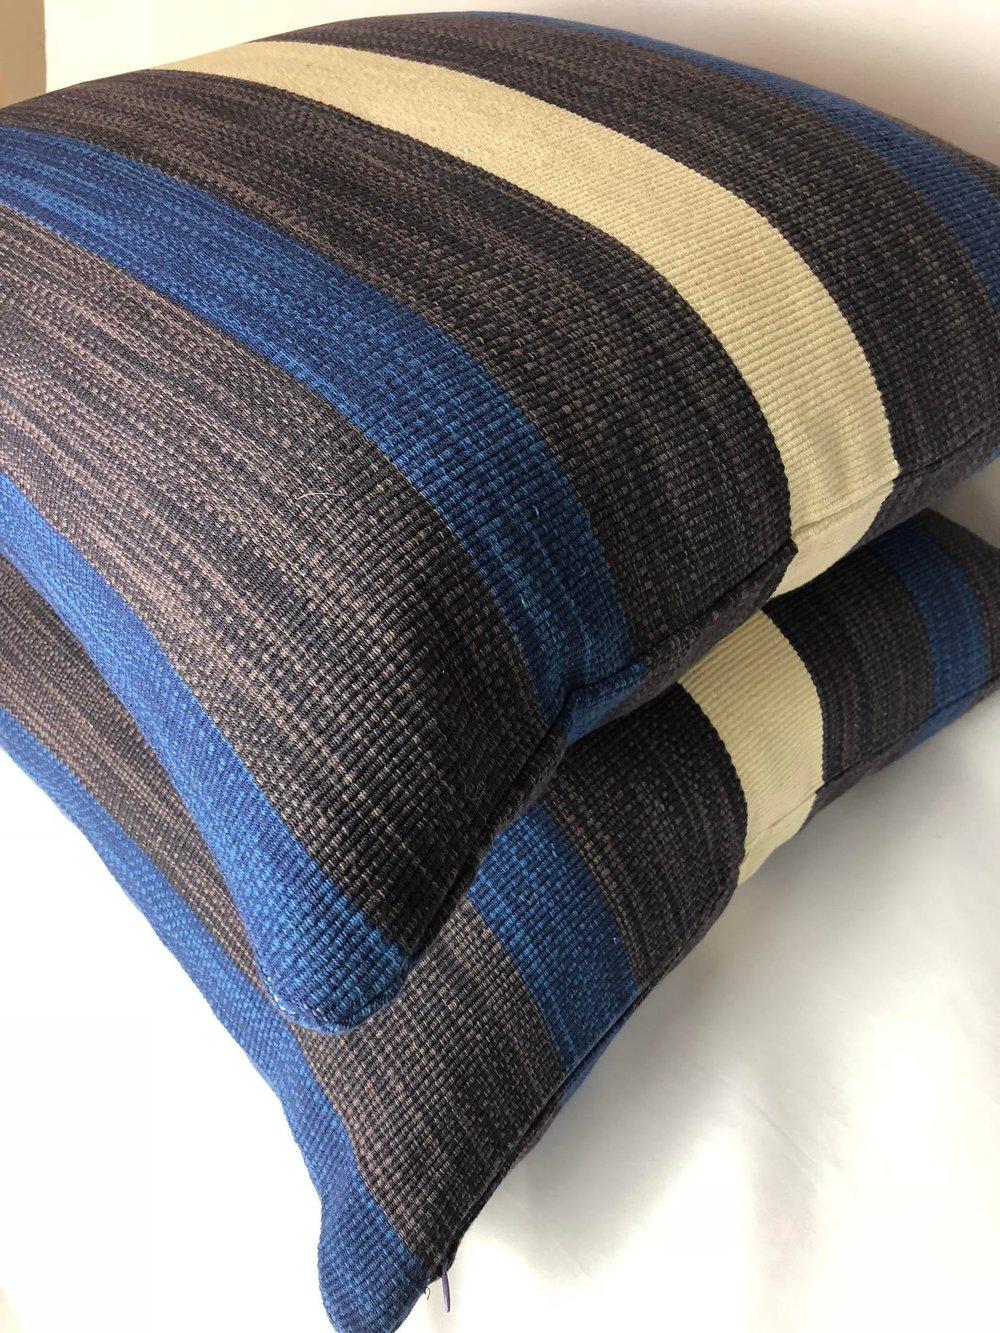 Ralph Lauren Contemporary Graphic Fabric Designer Pillow With 90/10 Down Insert